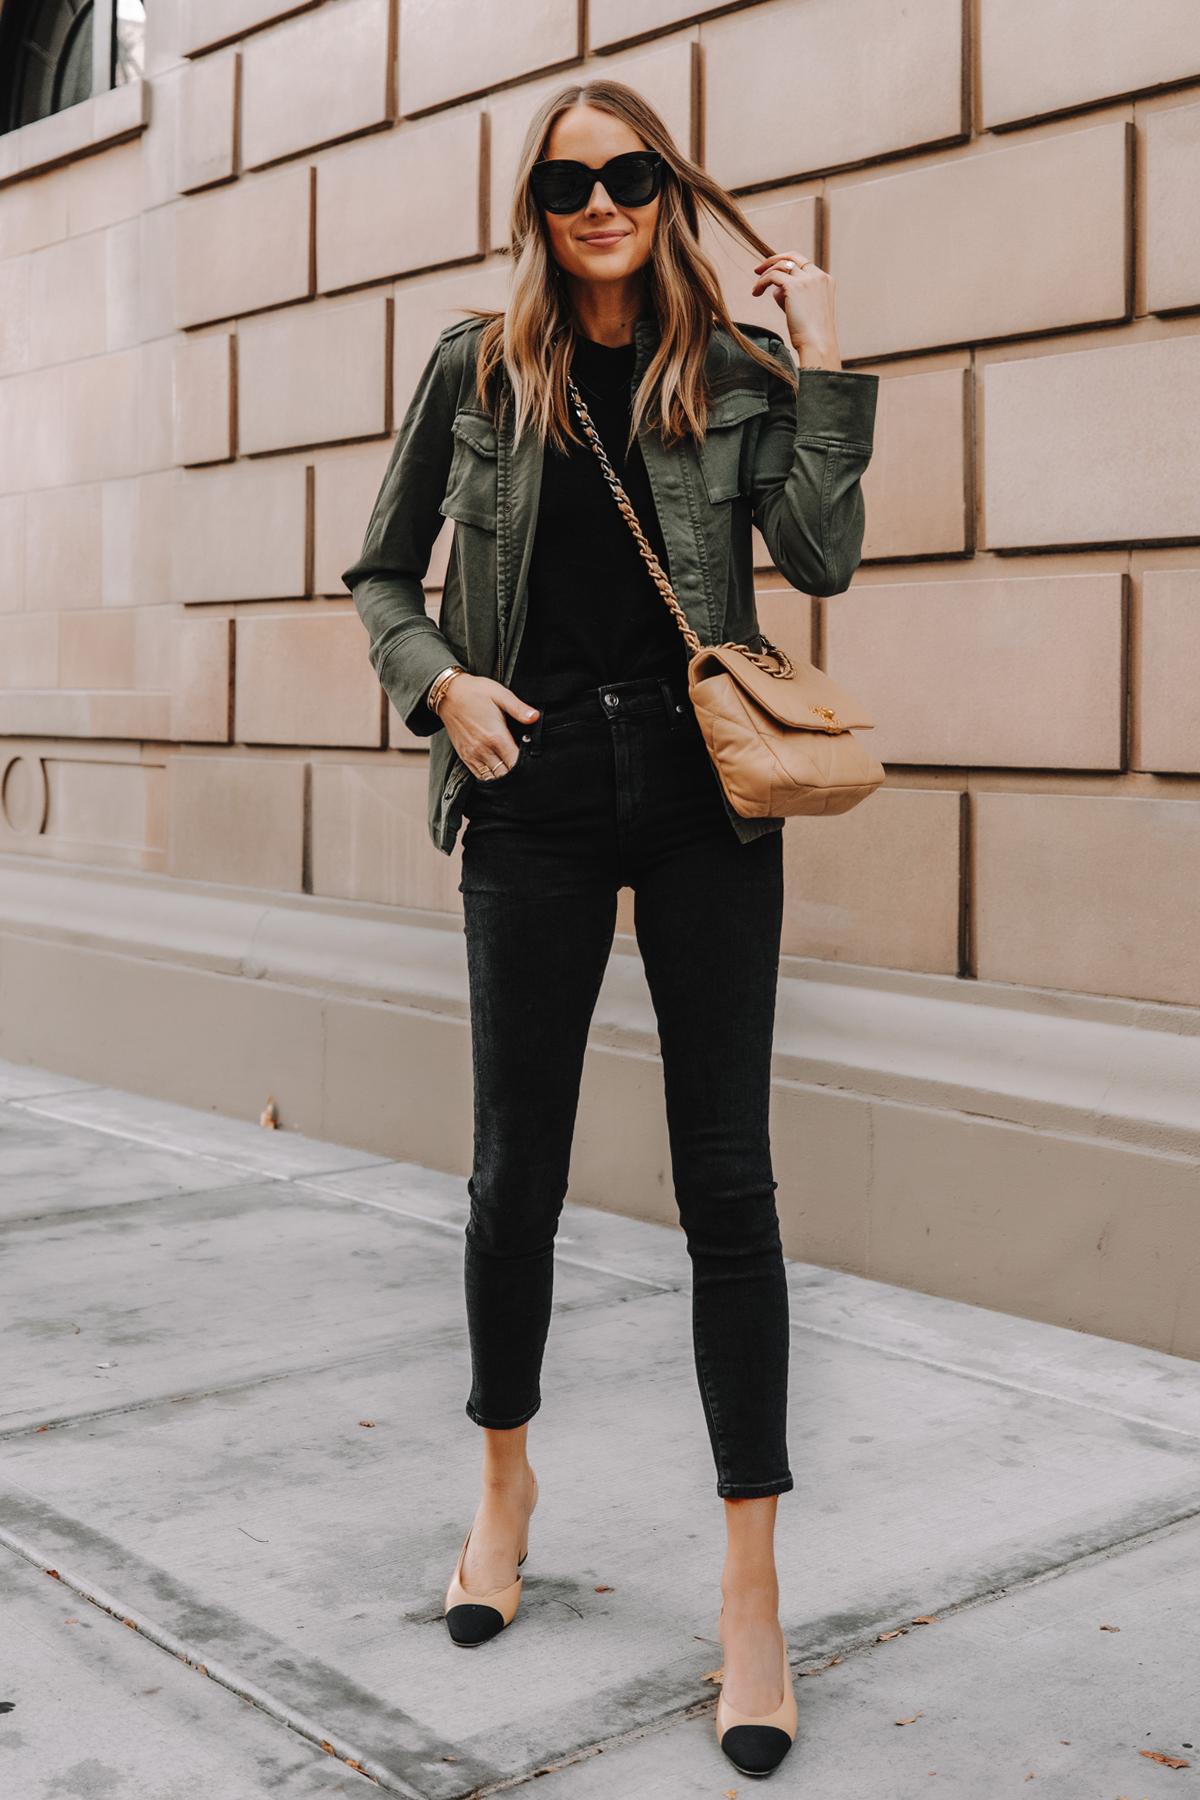 Fashion Jackson Wearing Anine Bing Green Utility Jacket Black Skinny Jeans Chanel Slingbacks Chanel 19 Small Dark Beige Handbag 2